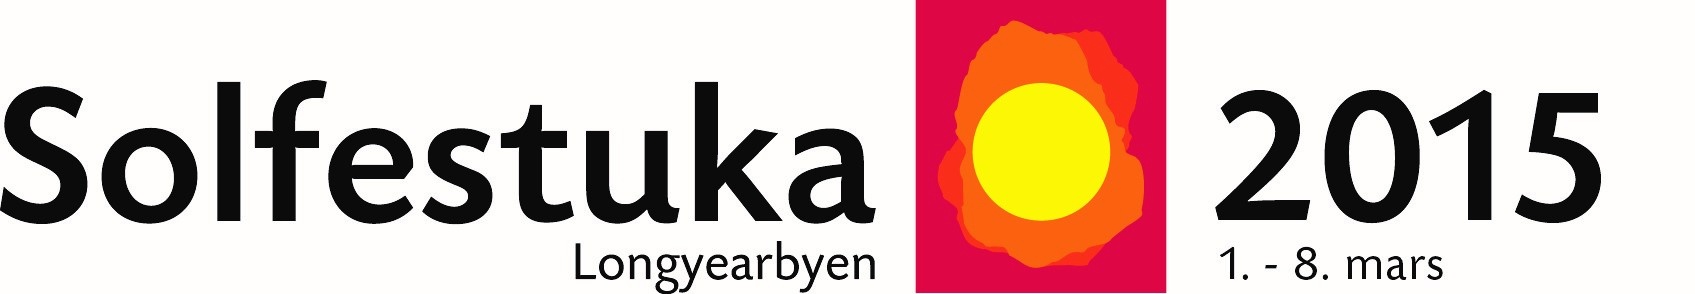 Solfestuka 2015 Logo.jpg